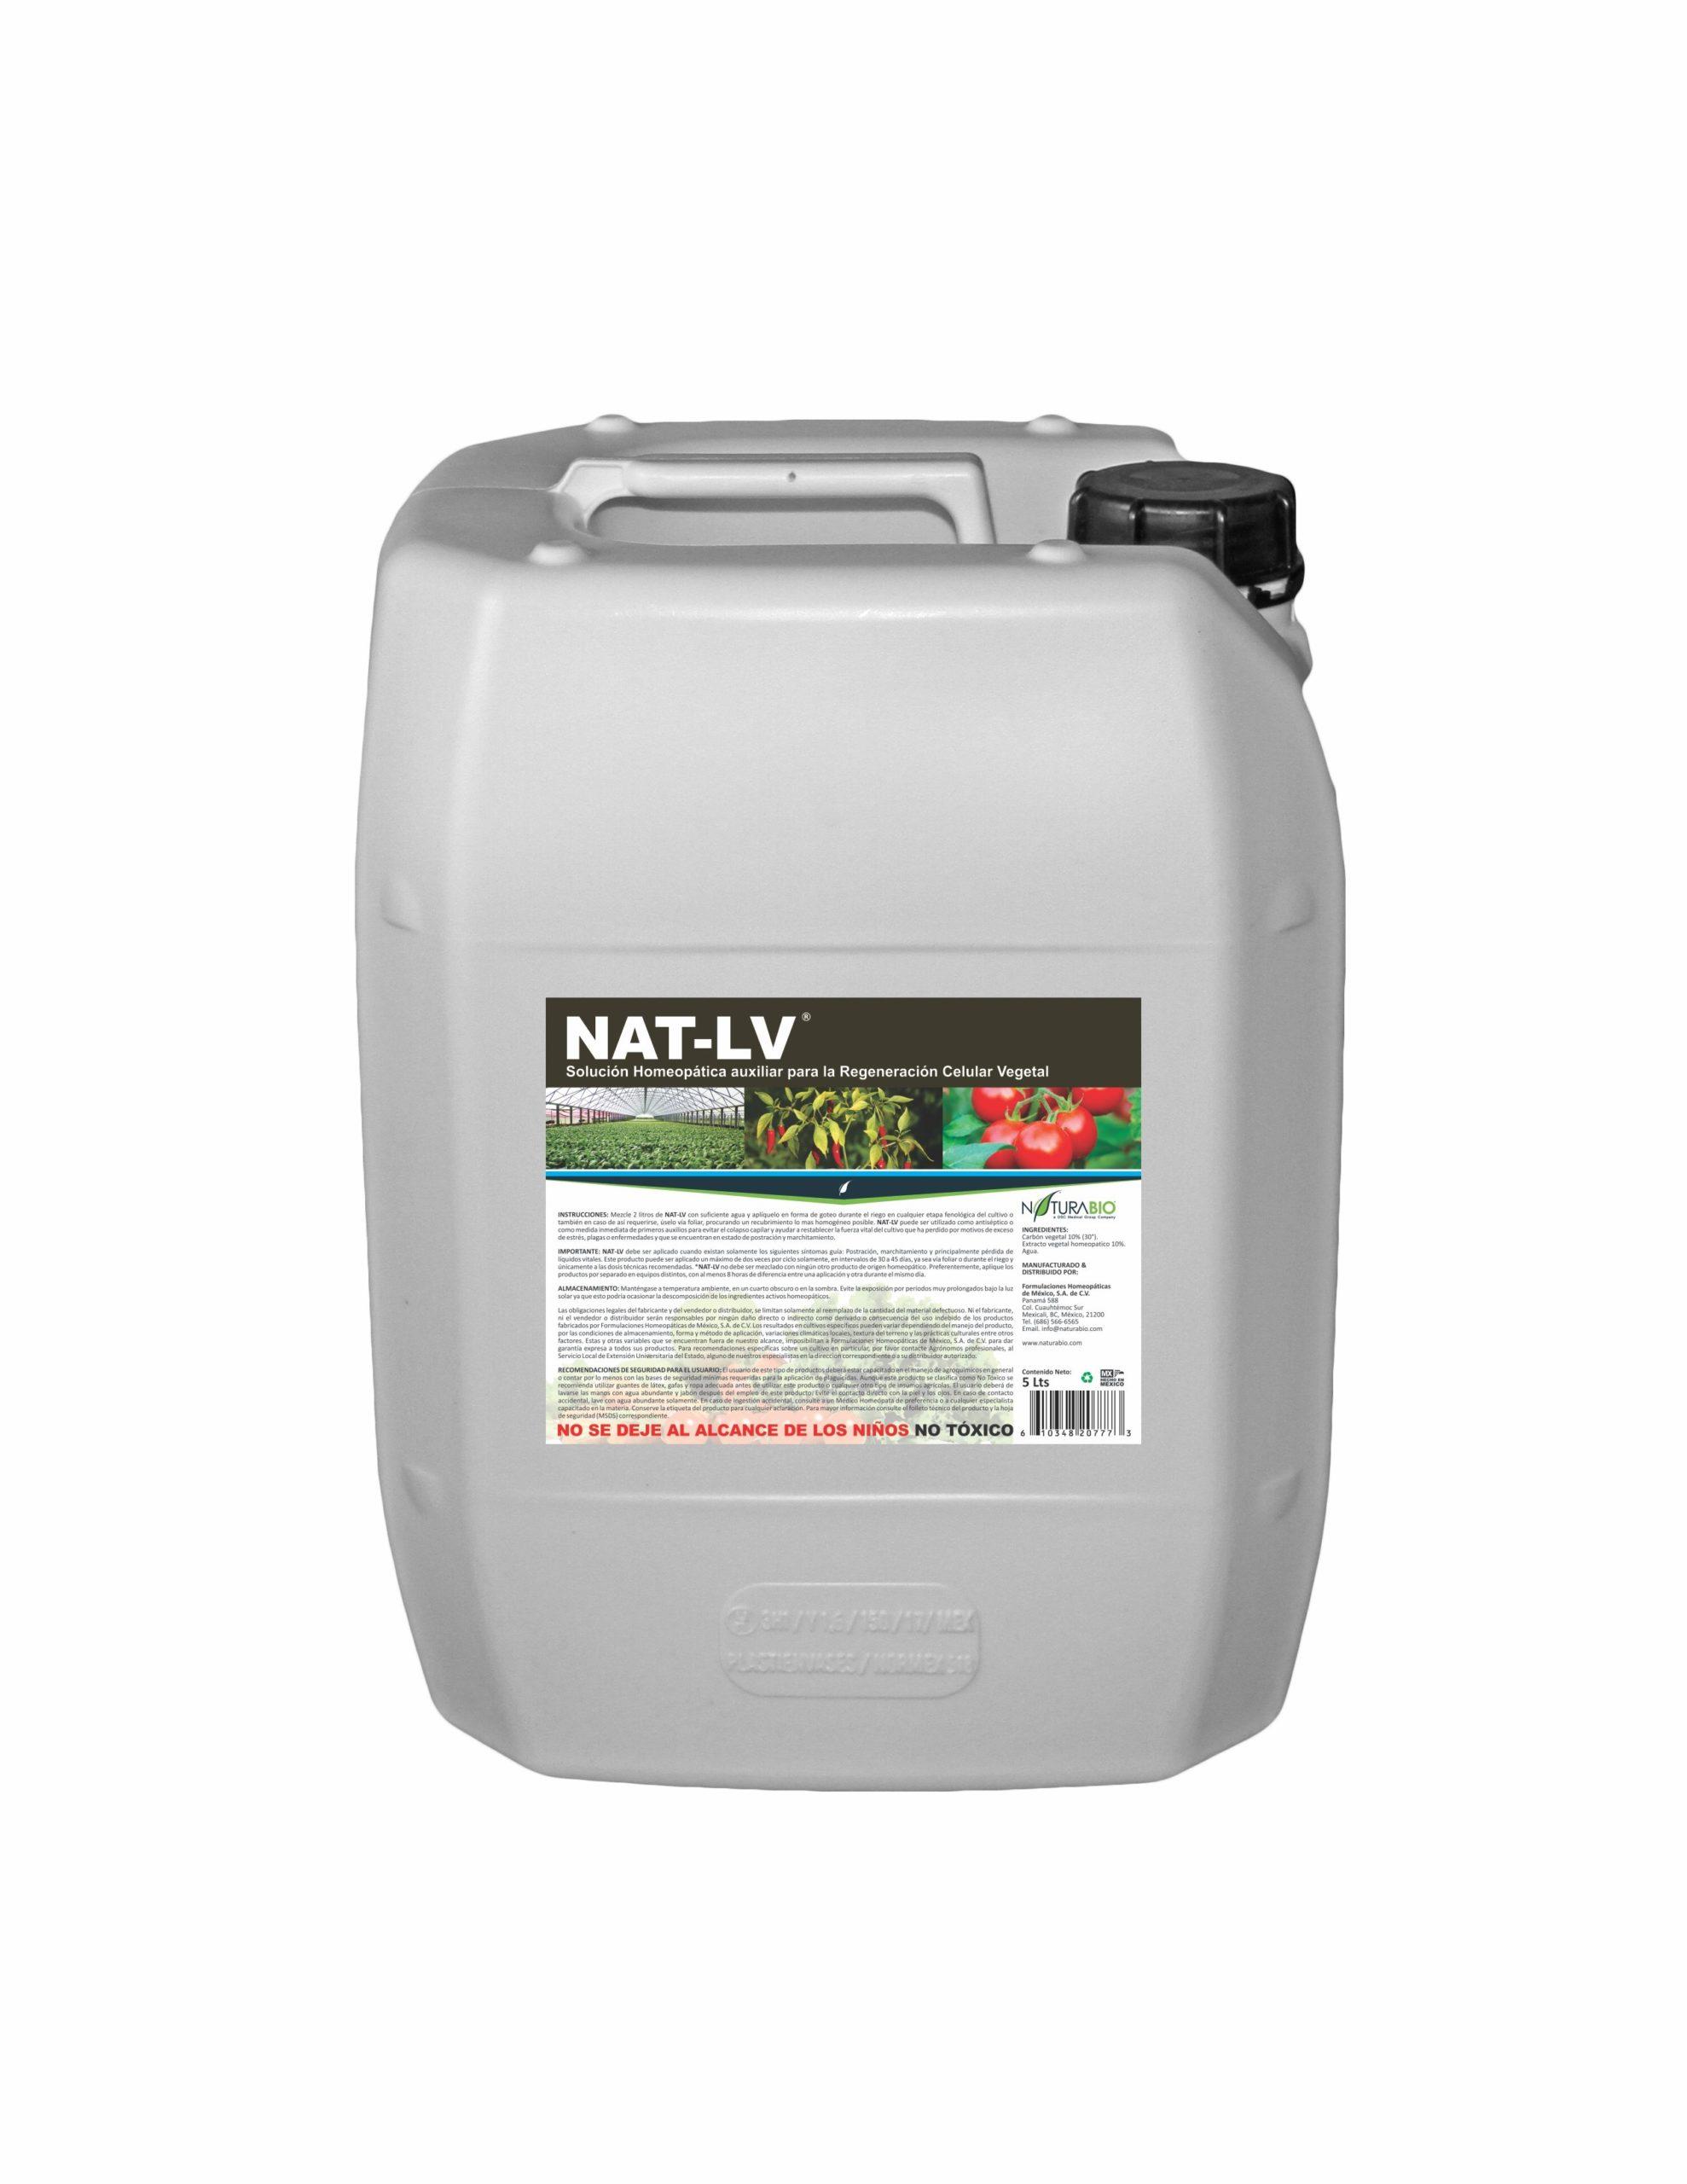 NAT-LV Solución Homeopática auxiliar para la Regeneración Celular